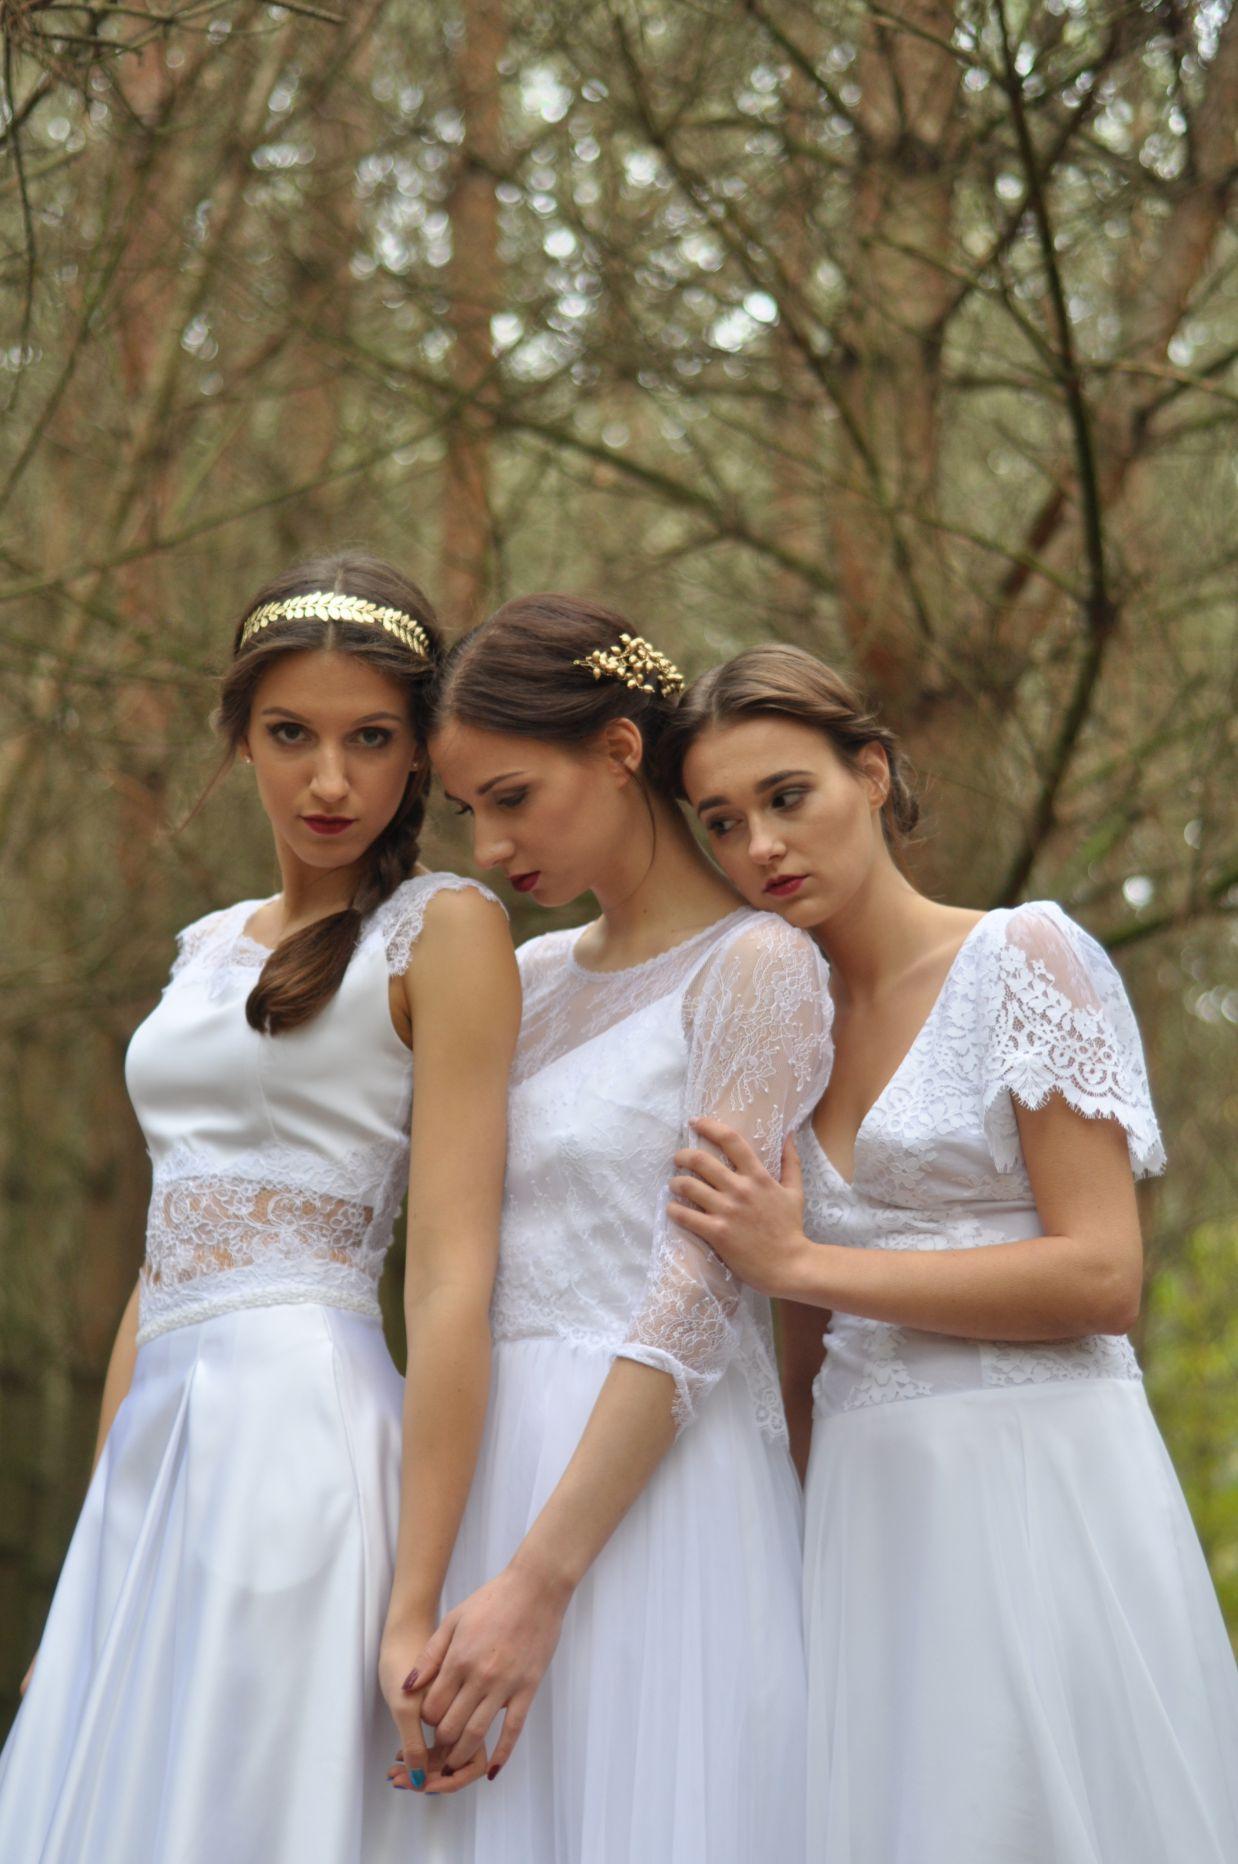 Www Ochocka Pl 2016 Wedding Dresses Wedding Dresses Dresses